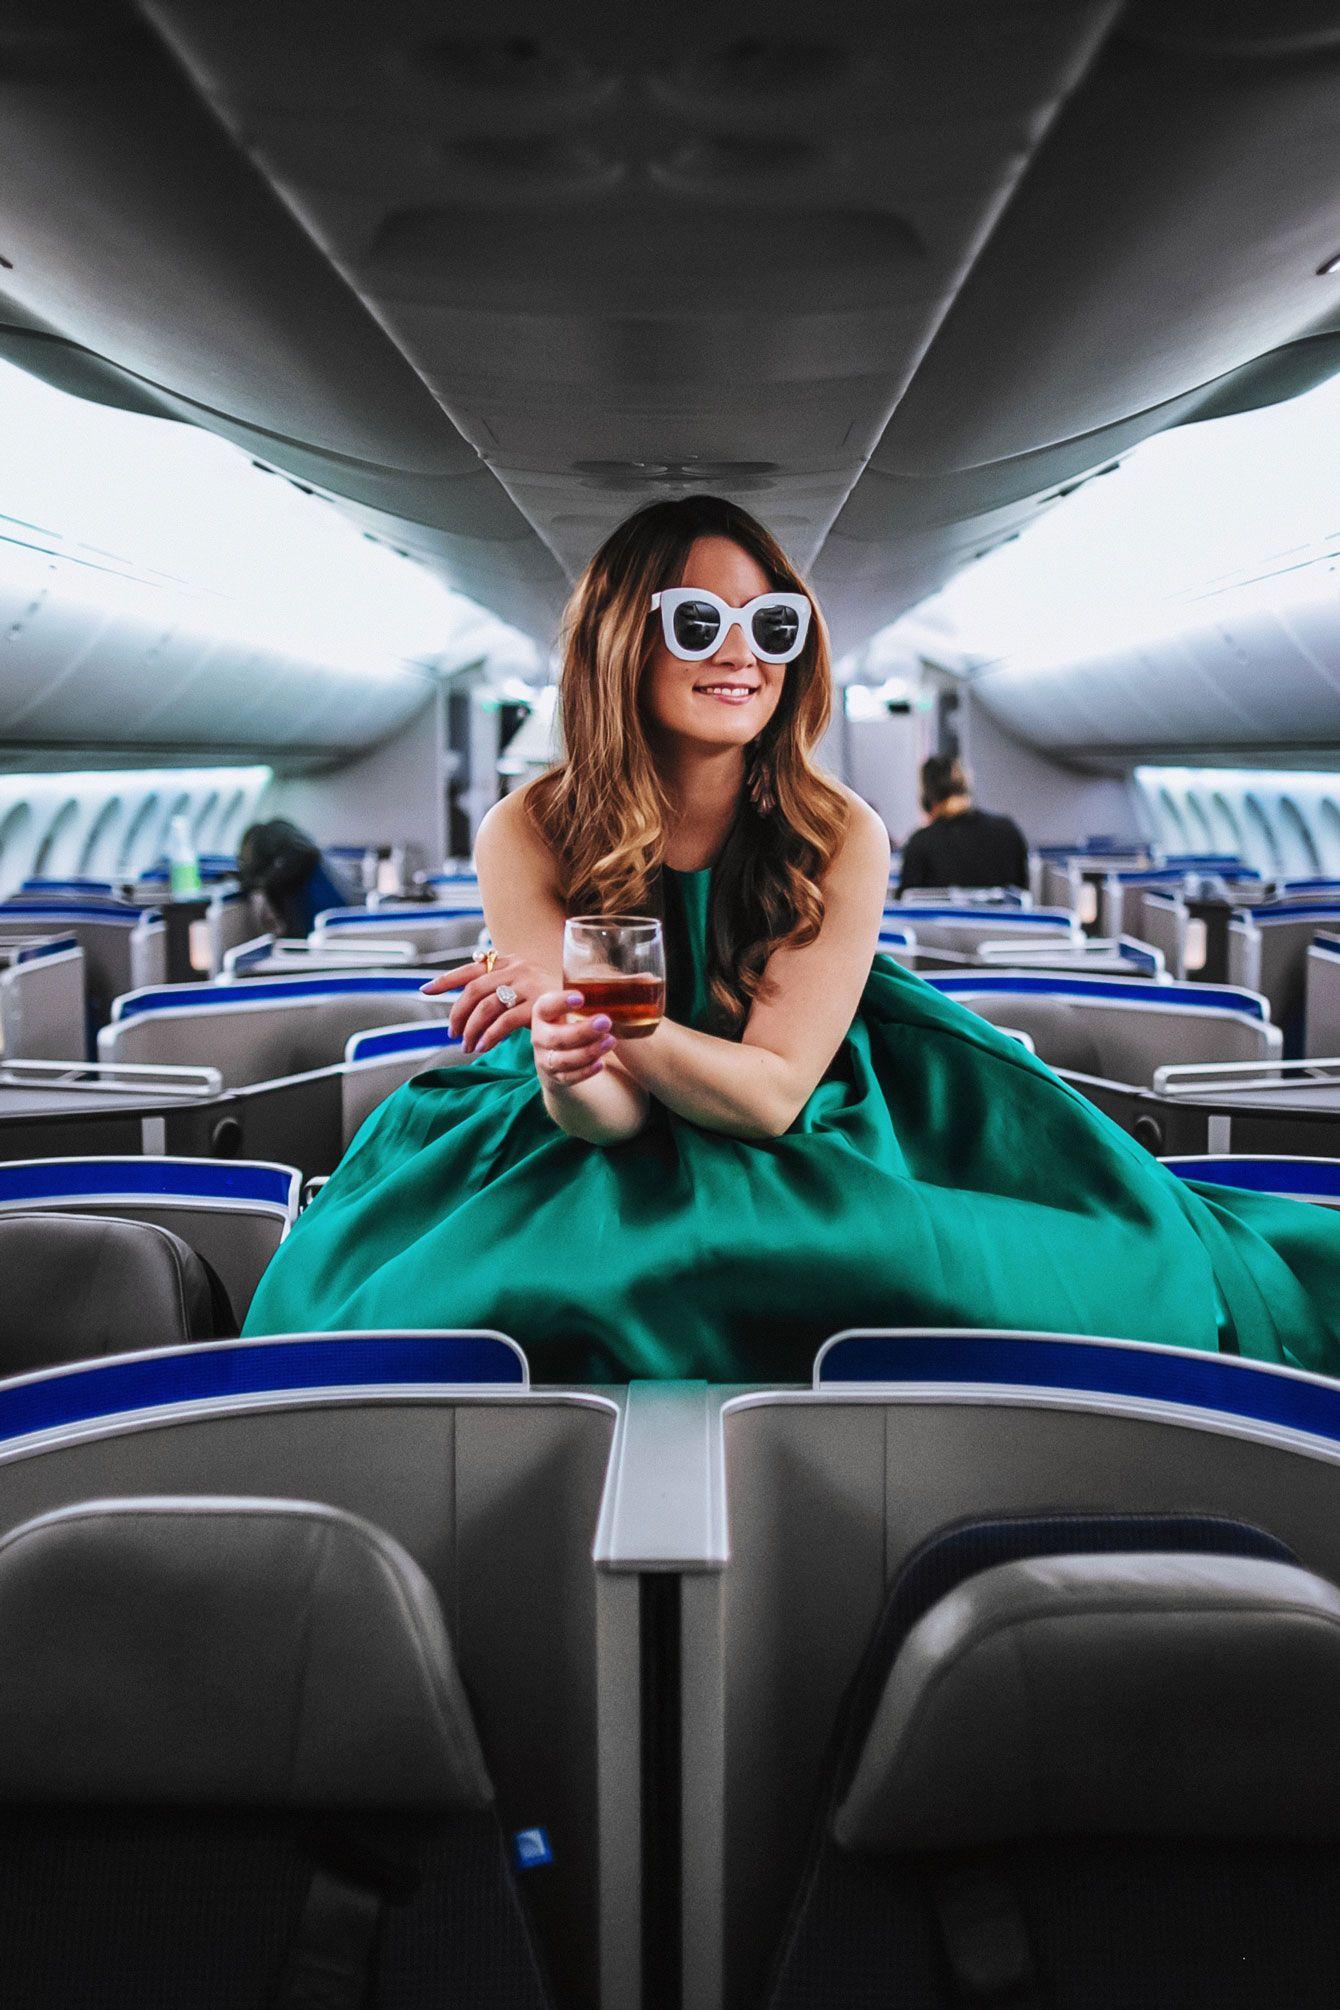 United 78710 dreamliner launch the unit travel